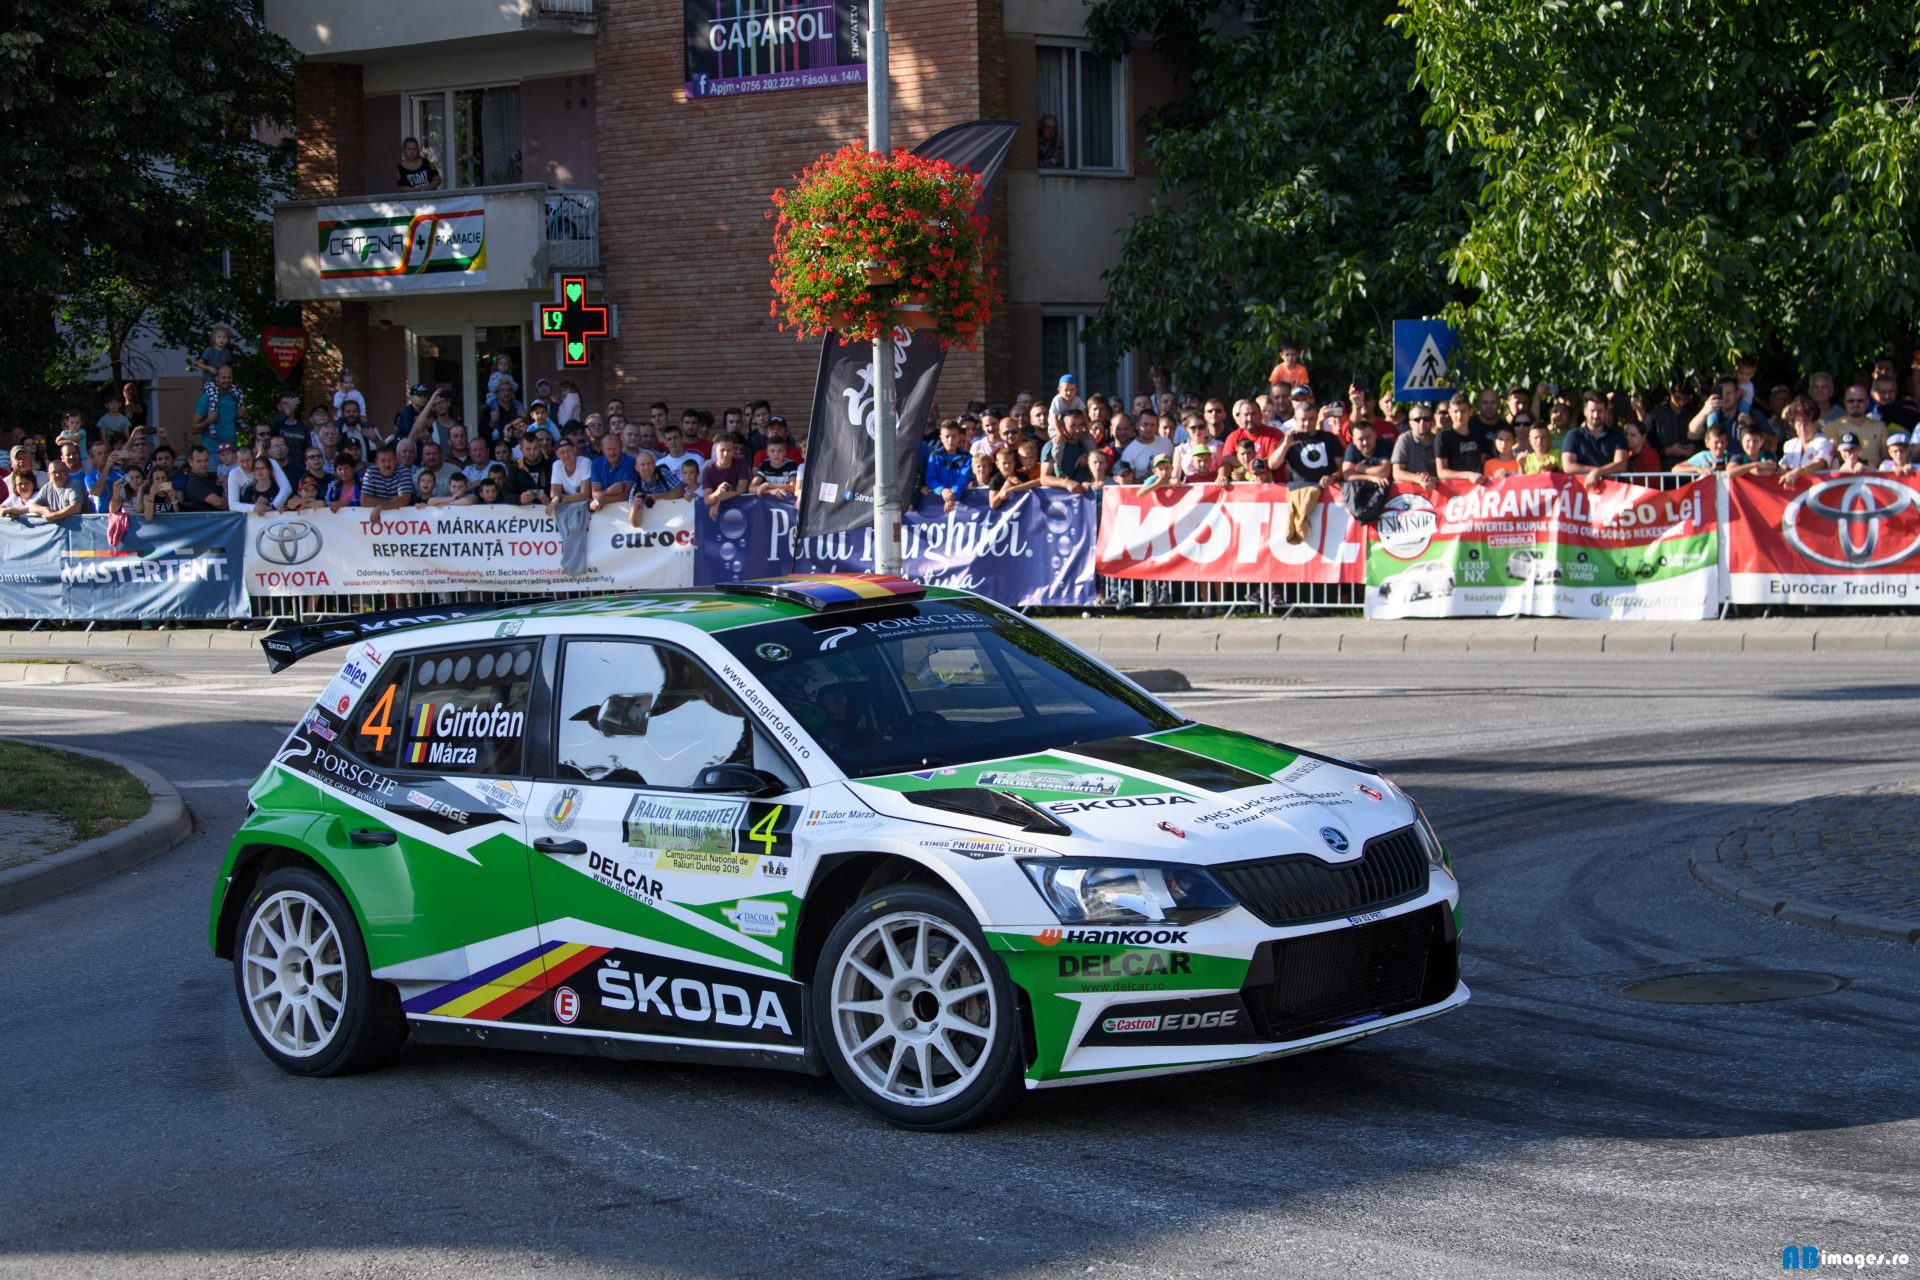 Transilvania Rally, o cursa cu miza pentru Dan Girtofan si Tudor Marza